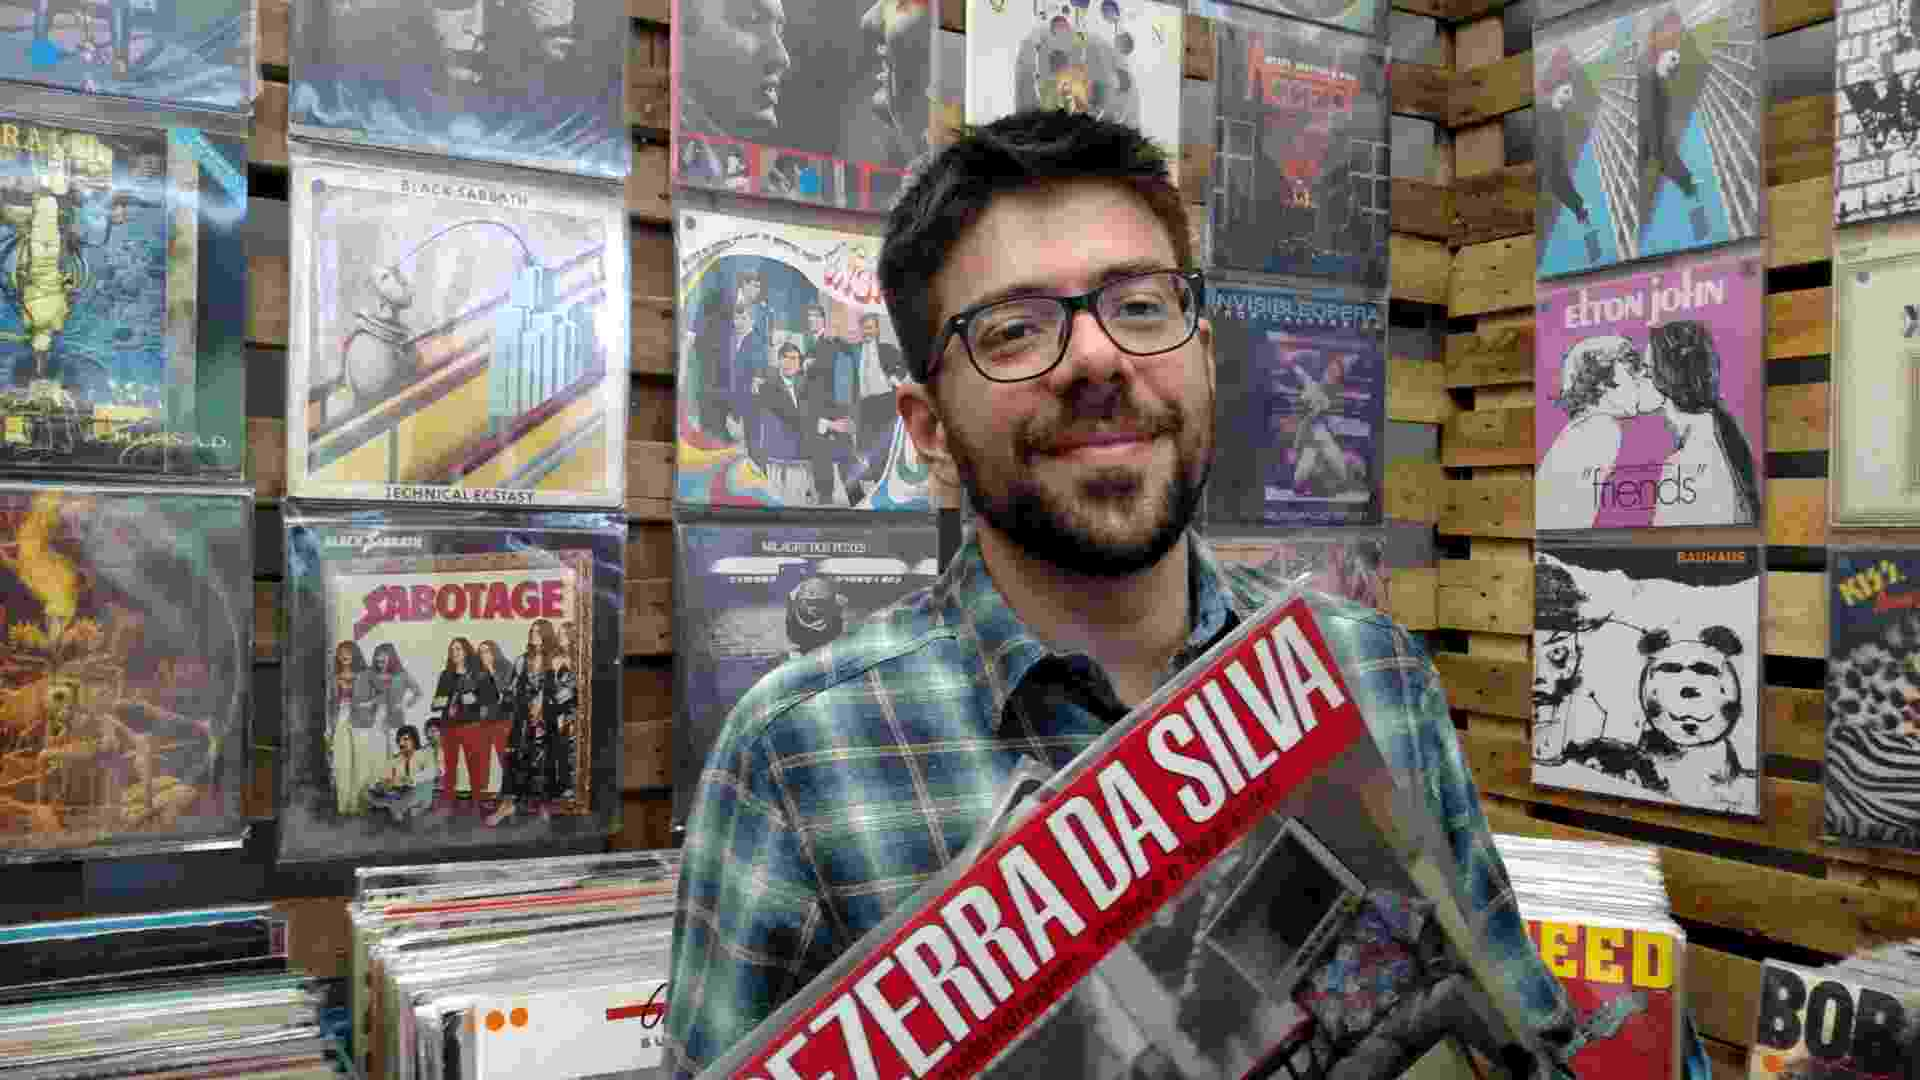 12.mar.2016 - O professor Rodrigo Miranda, 35, comprou LPs do sambista Bezerra da Silva e do grupo Talking Heads no Lollapalooza Brasil 2016 - Leonardo Rodrigues/UOL